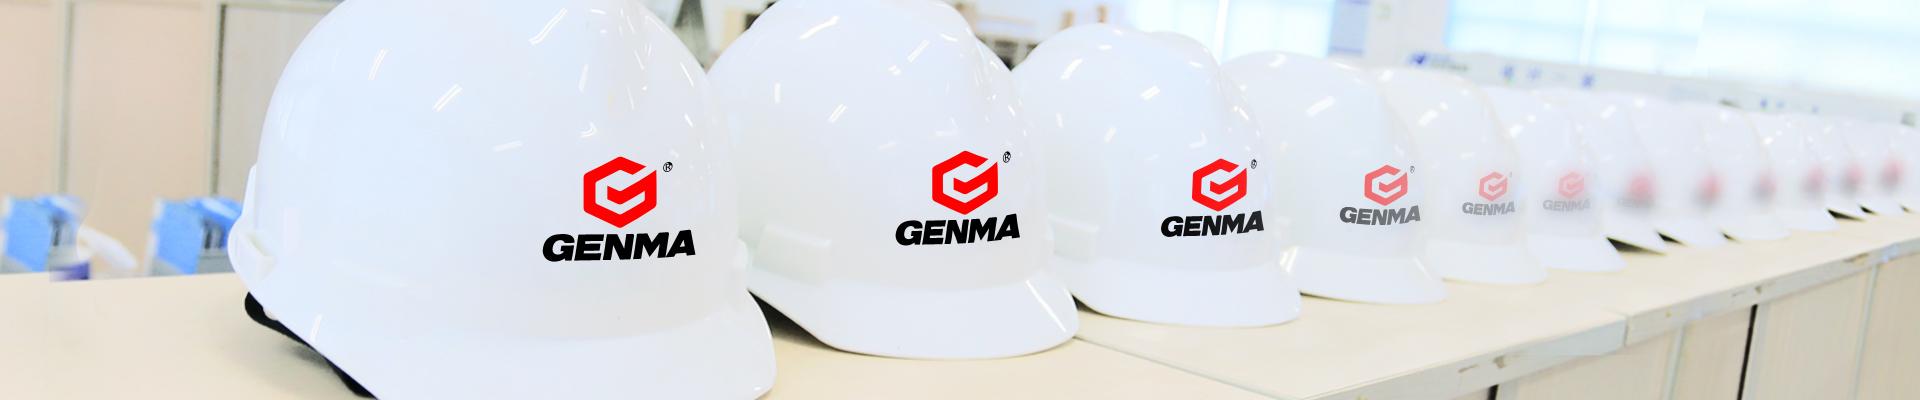 GENMA这套设备亮相央视新闻频道